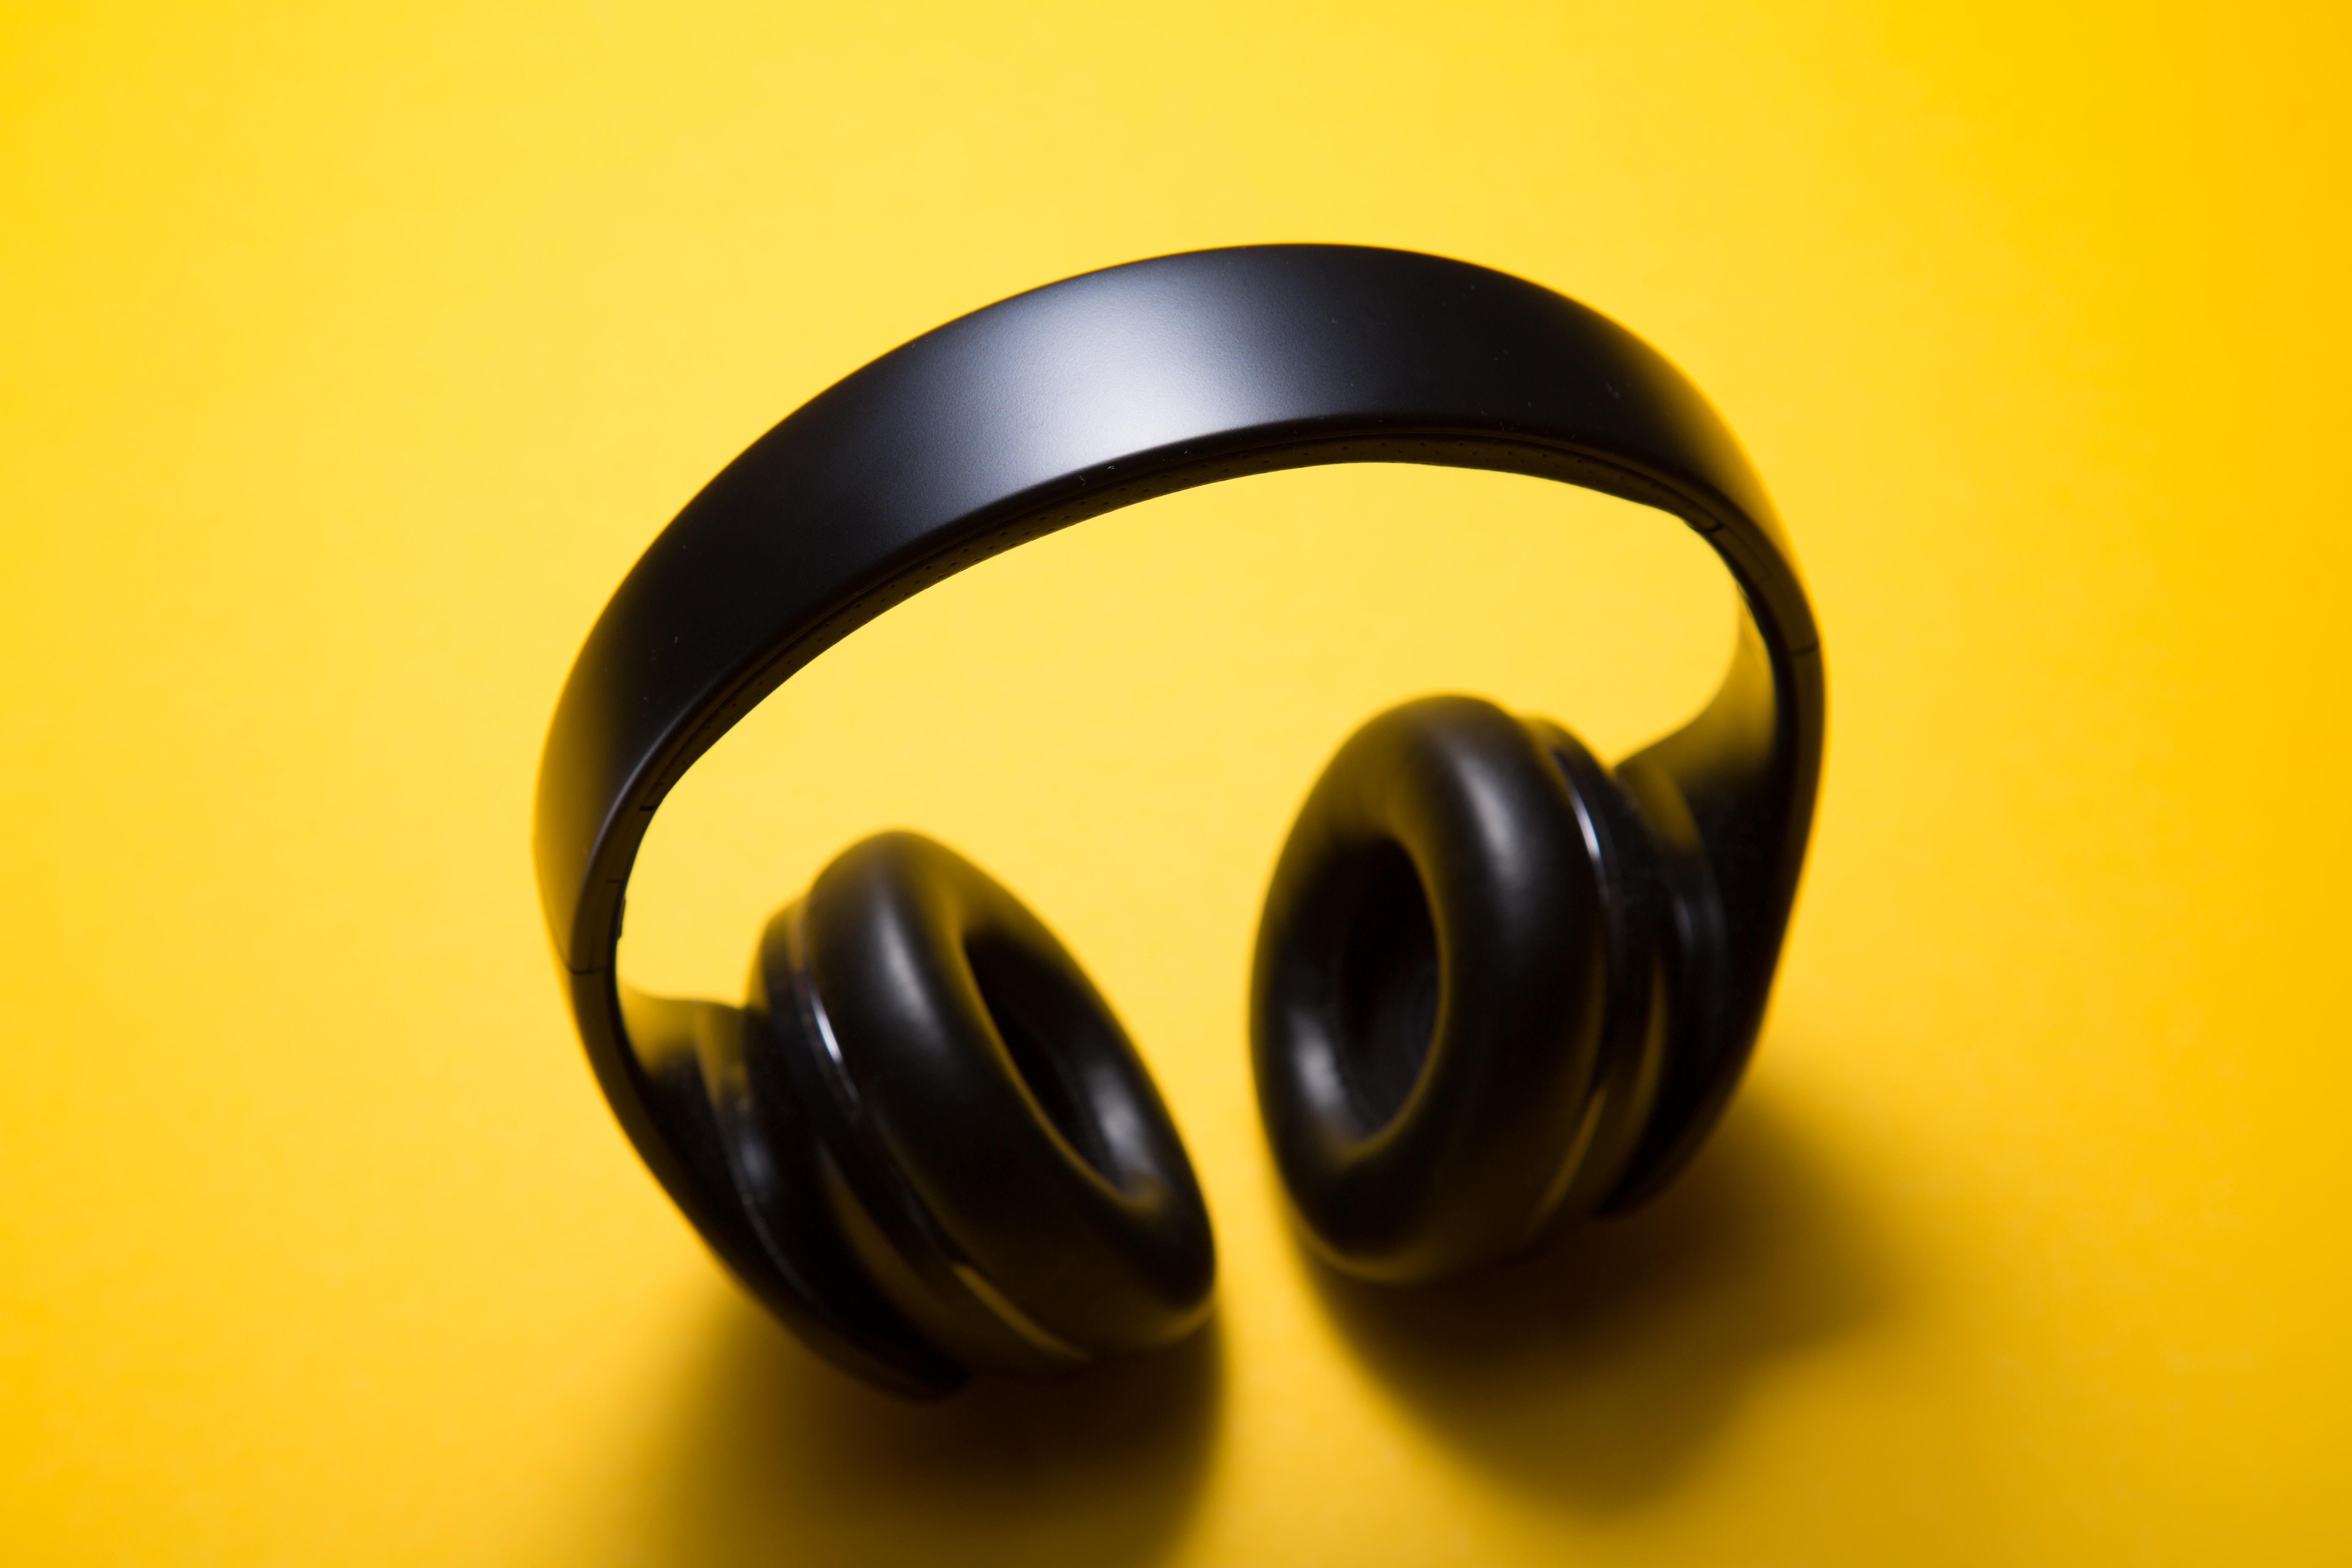 wireless headphones with yellow background